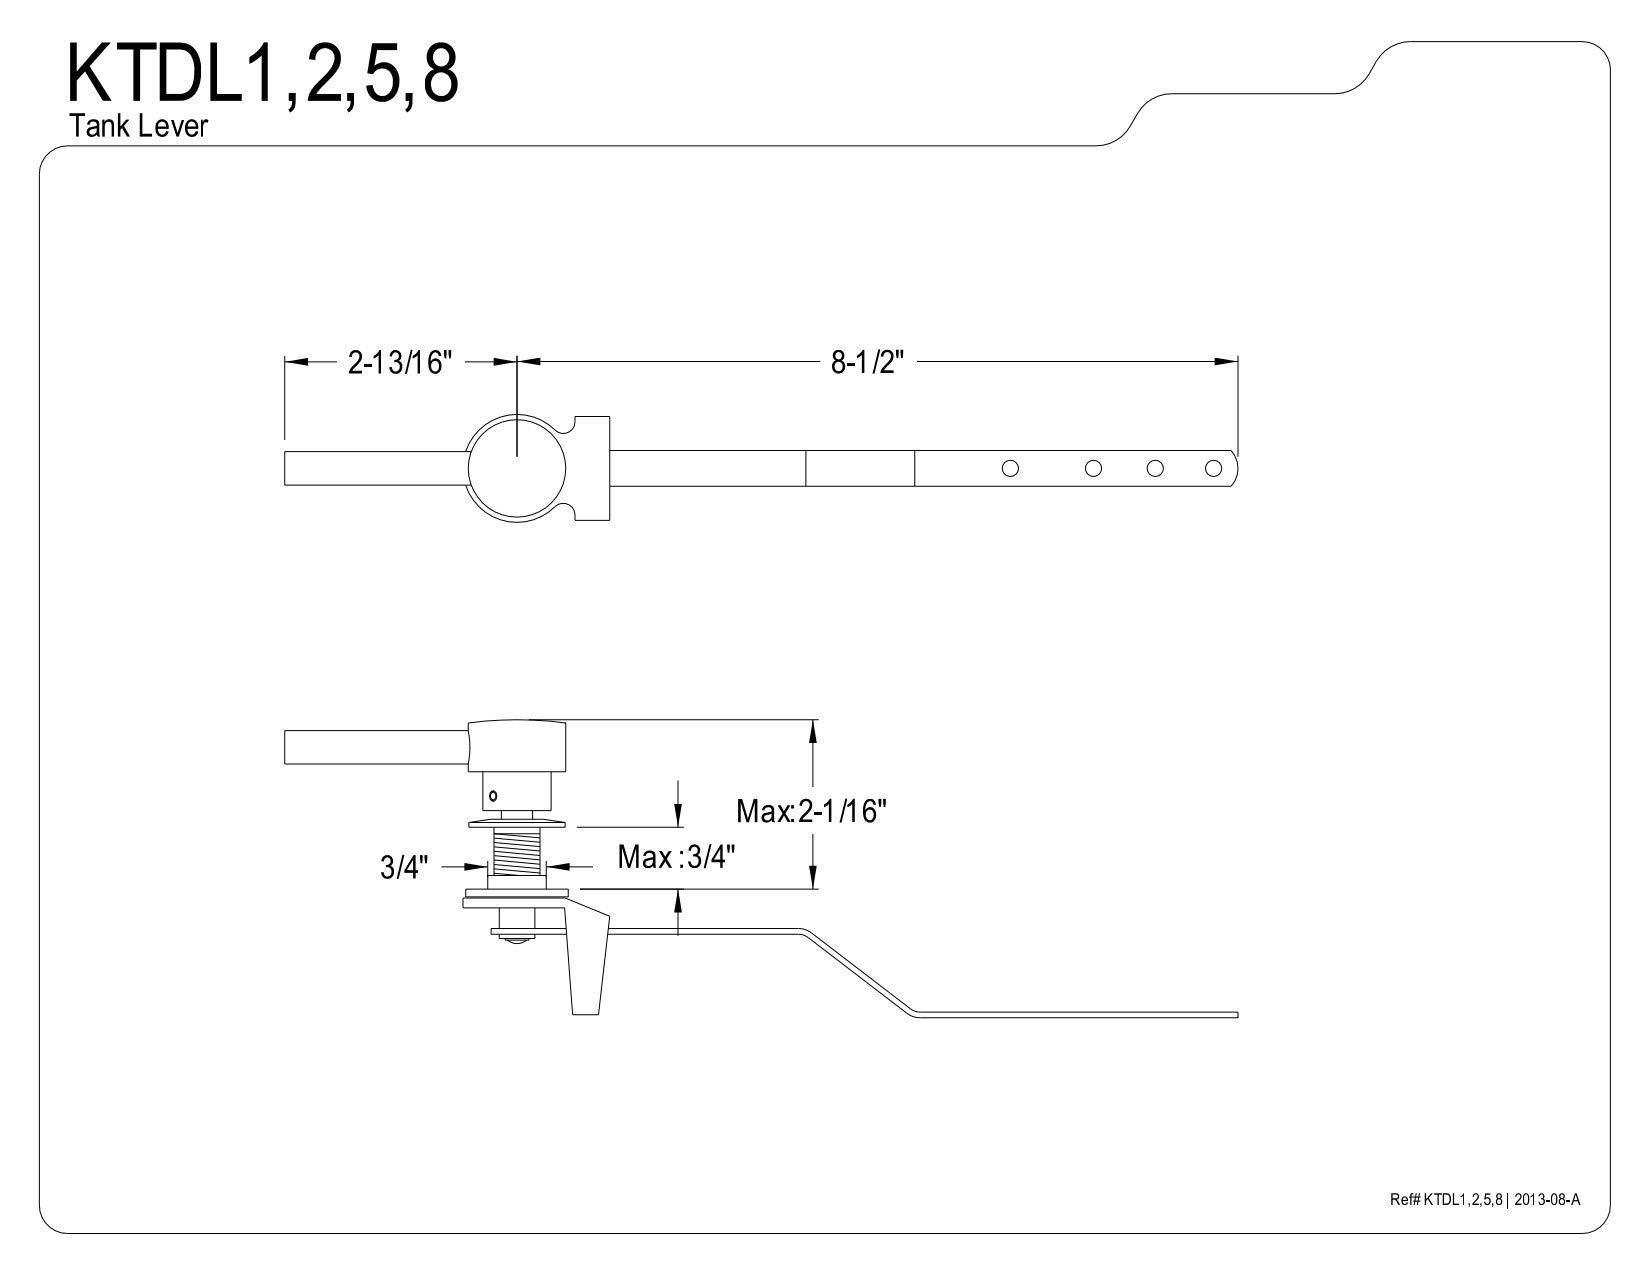 Kingston Brass KTDL2 Concord Tank Lever, Polished Brass, 2-13/16'' Handle Length by Kingston Brass (Image #5)